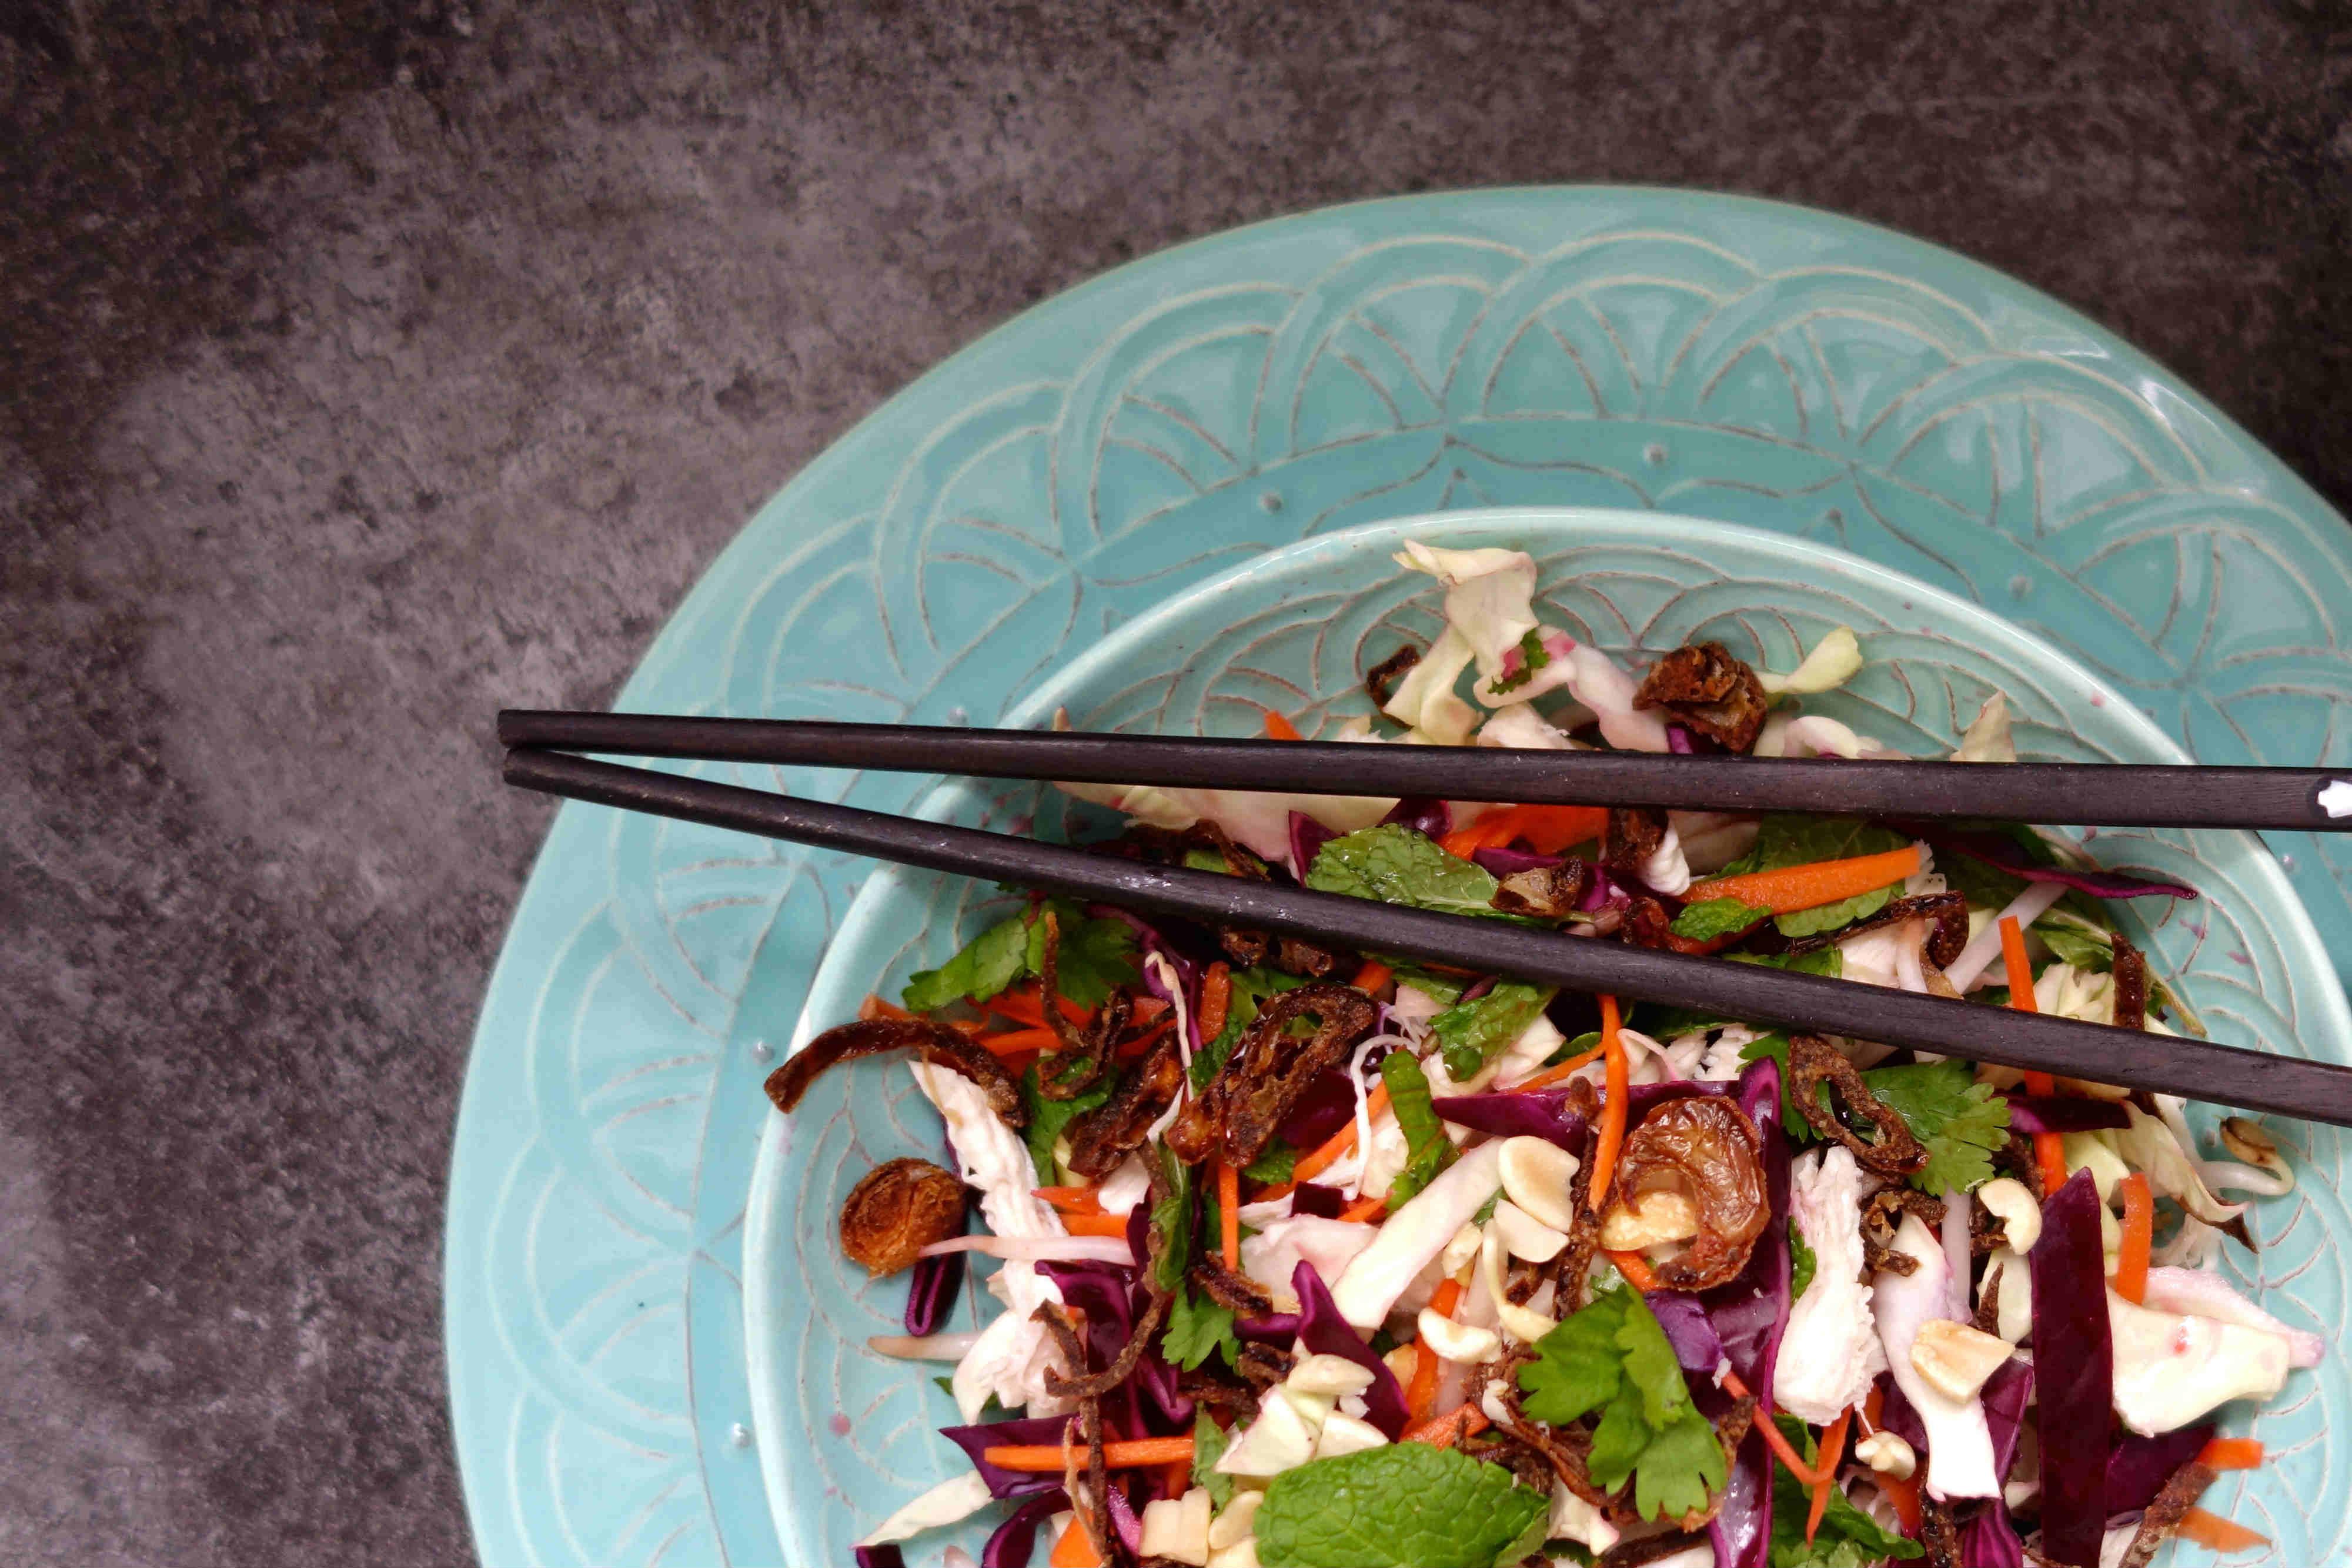 Goi ga, or shredded chicken salad